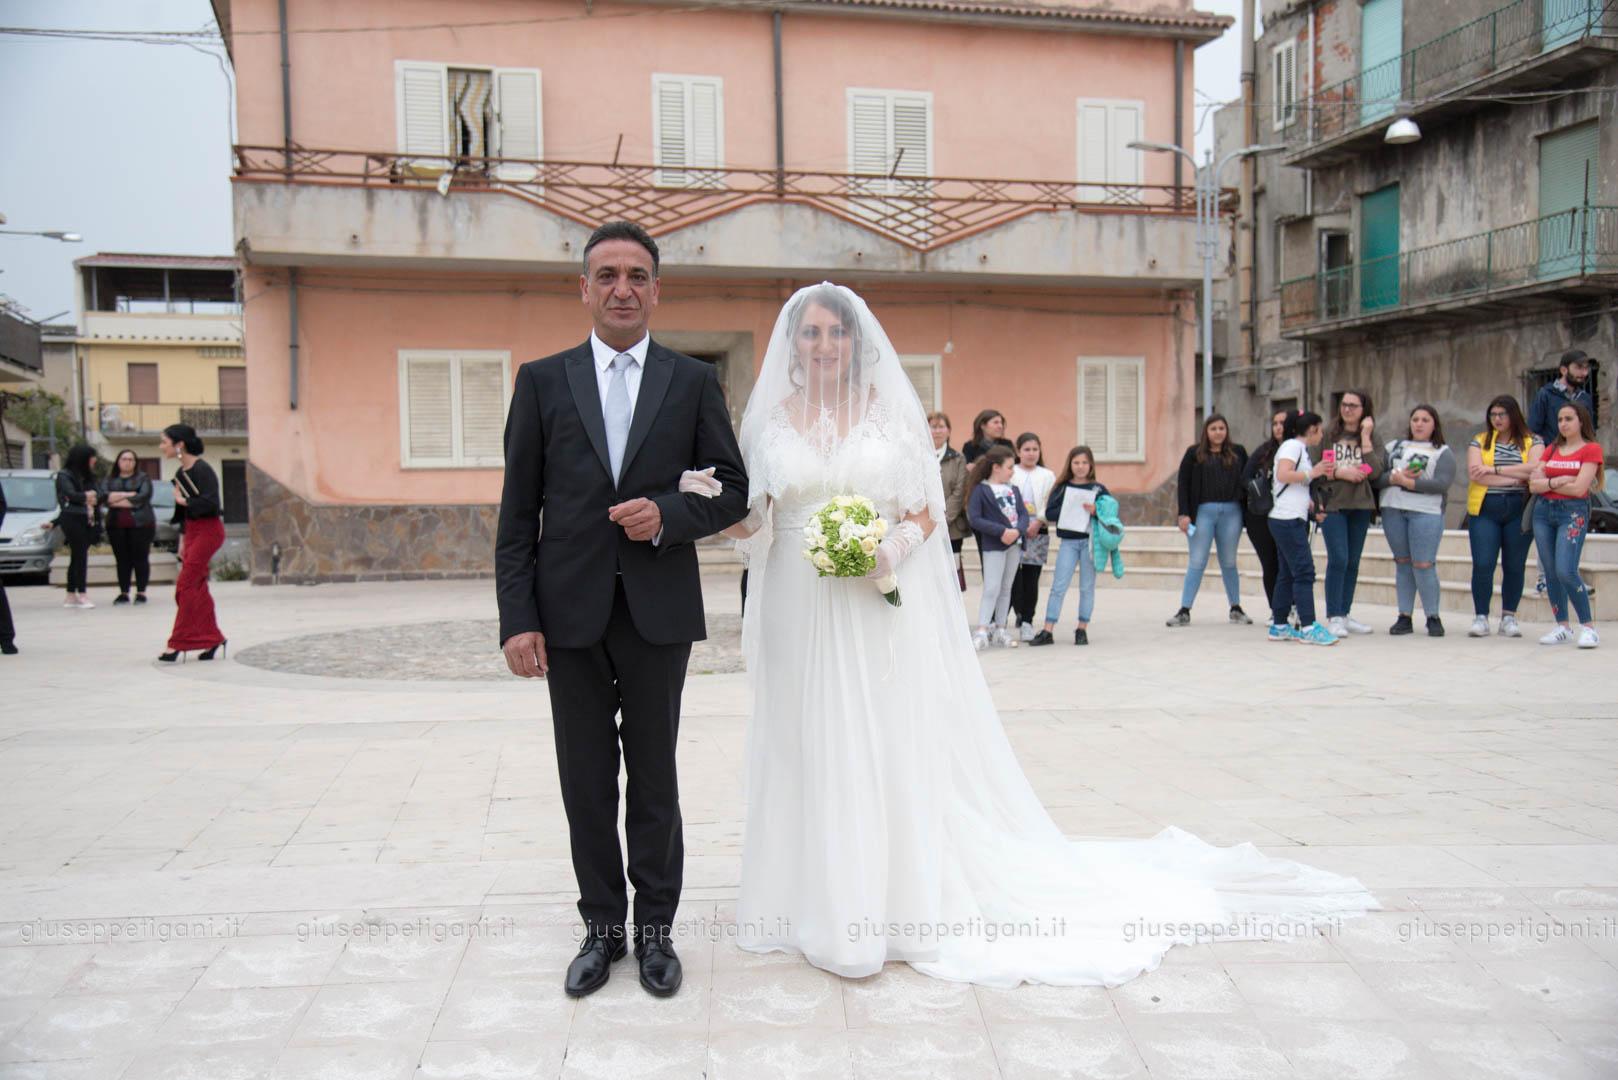 GiuseppeTiganiVisual 48